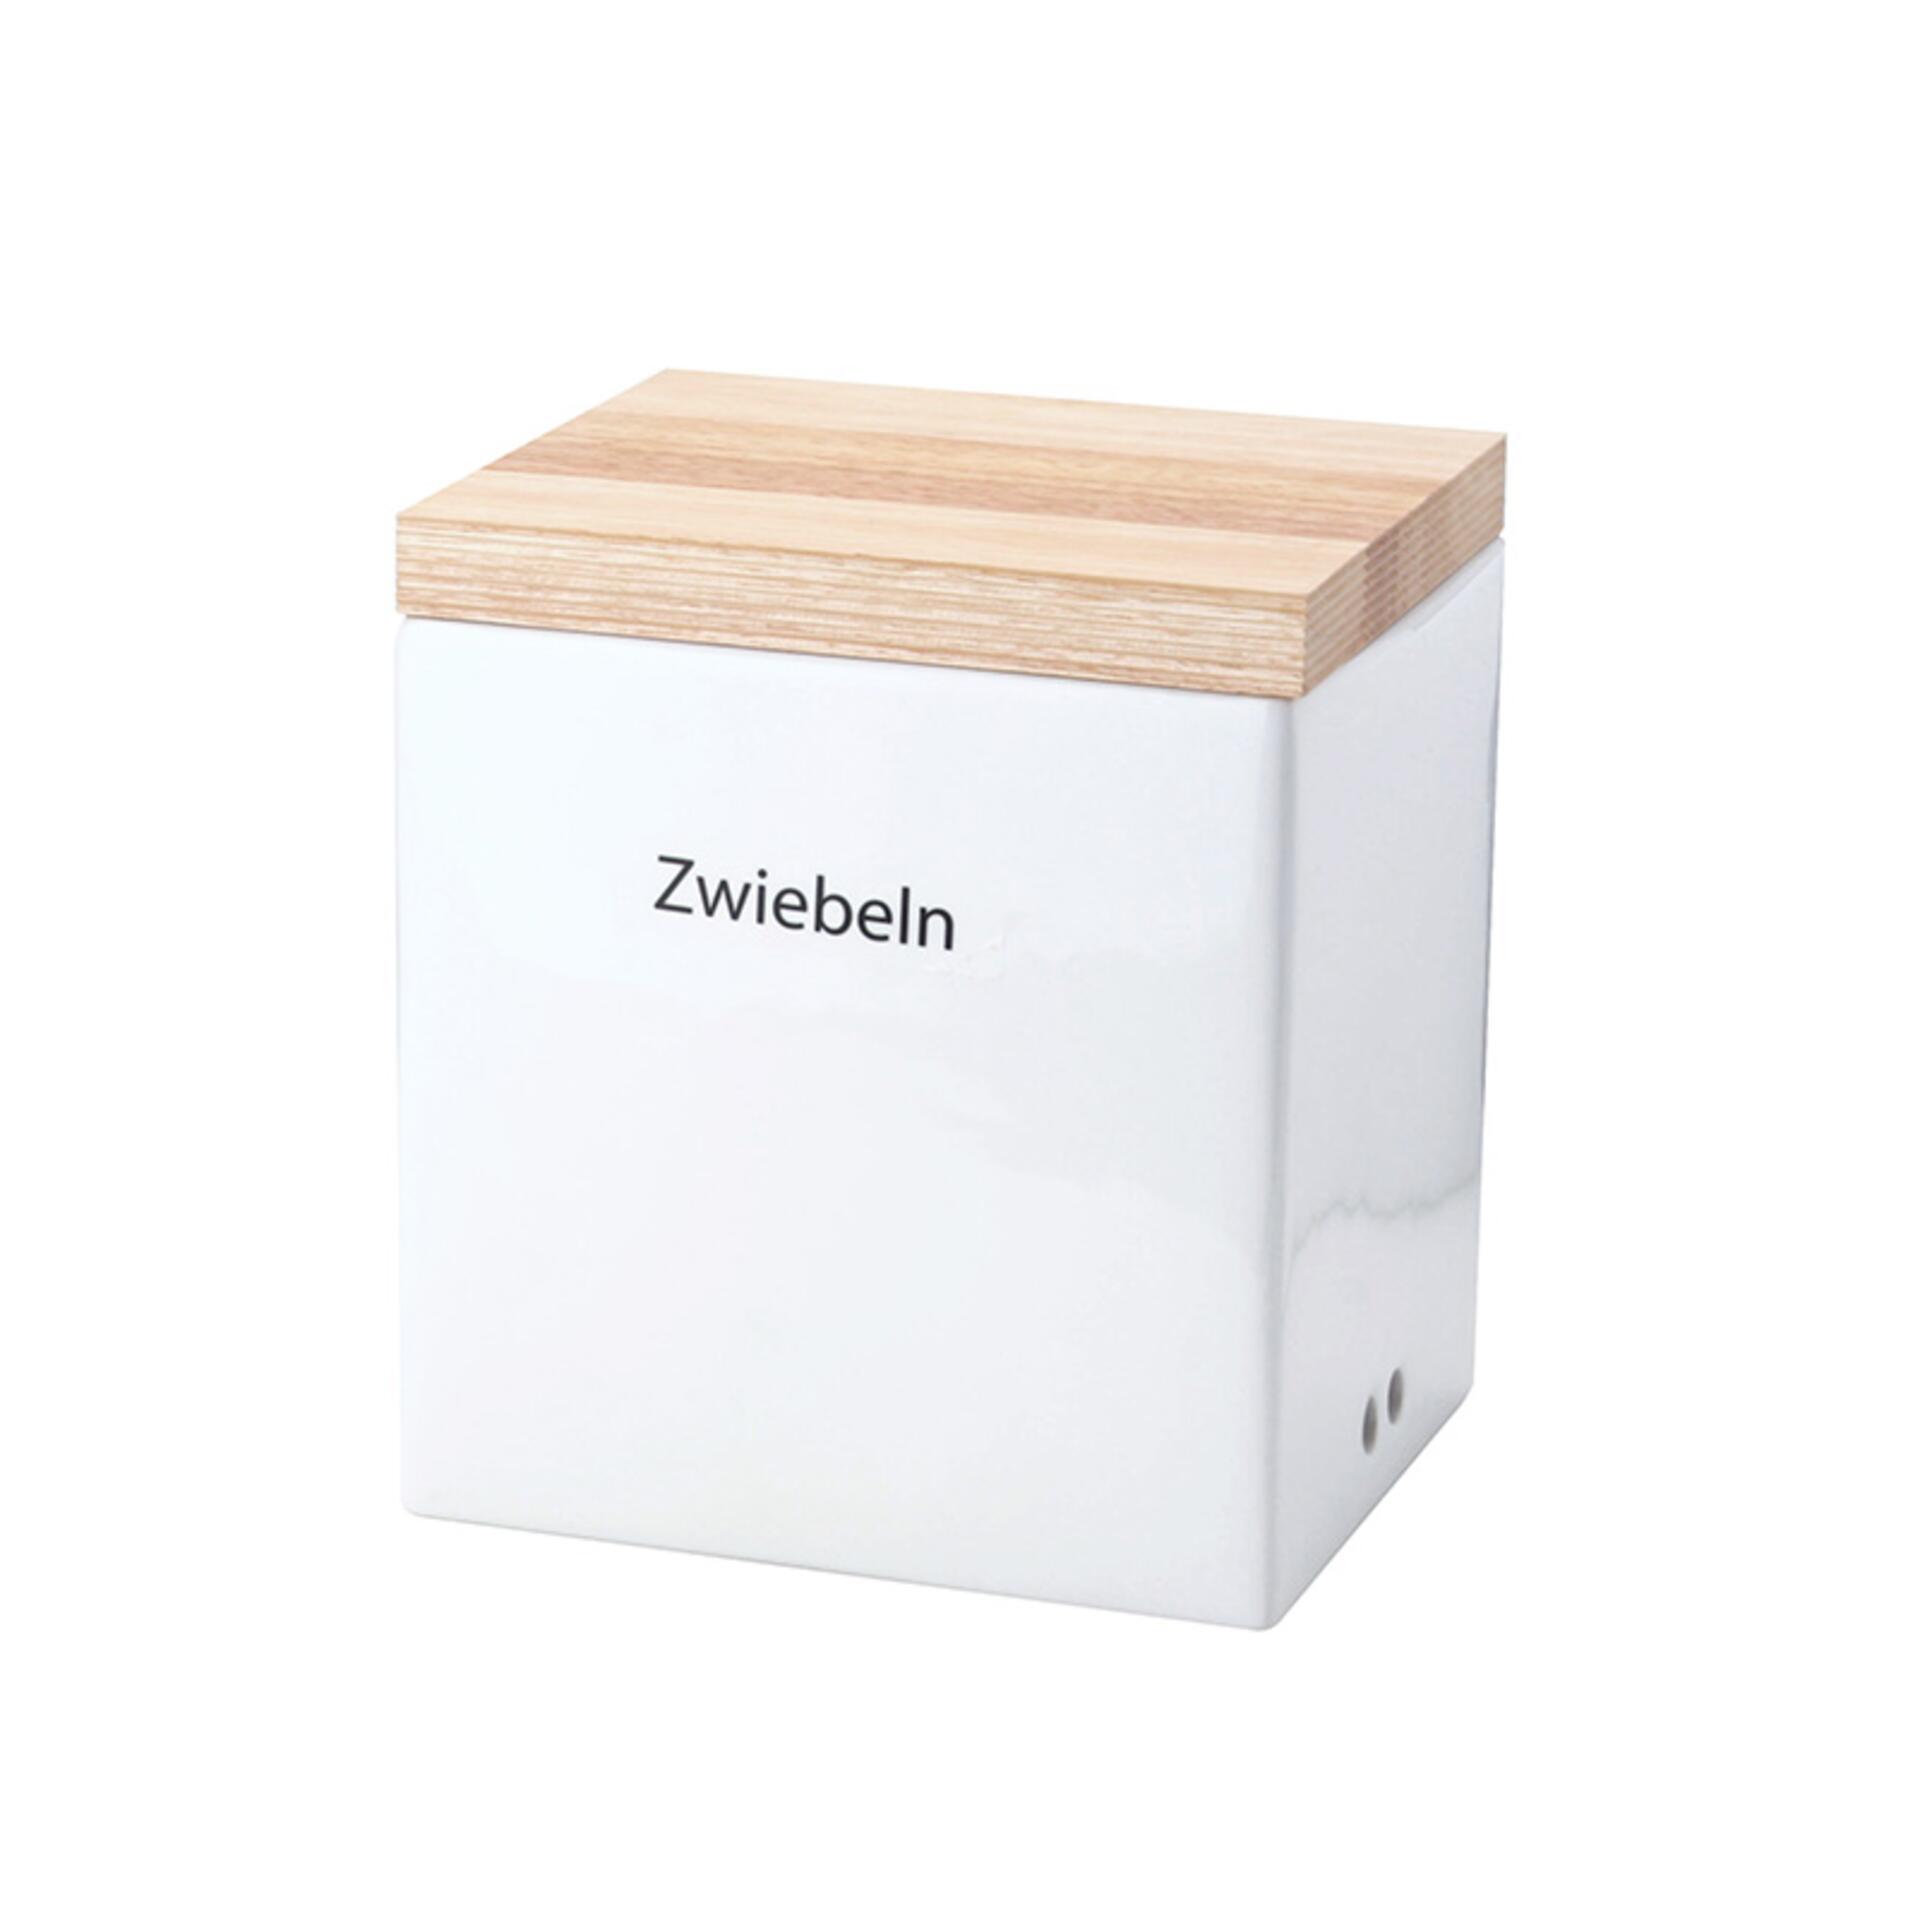 Continenta Vorratsdose mit Holzdeckel 18 x 15,5 x 20,5 cm